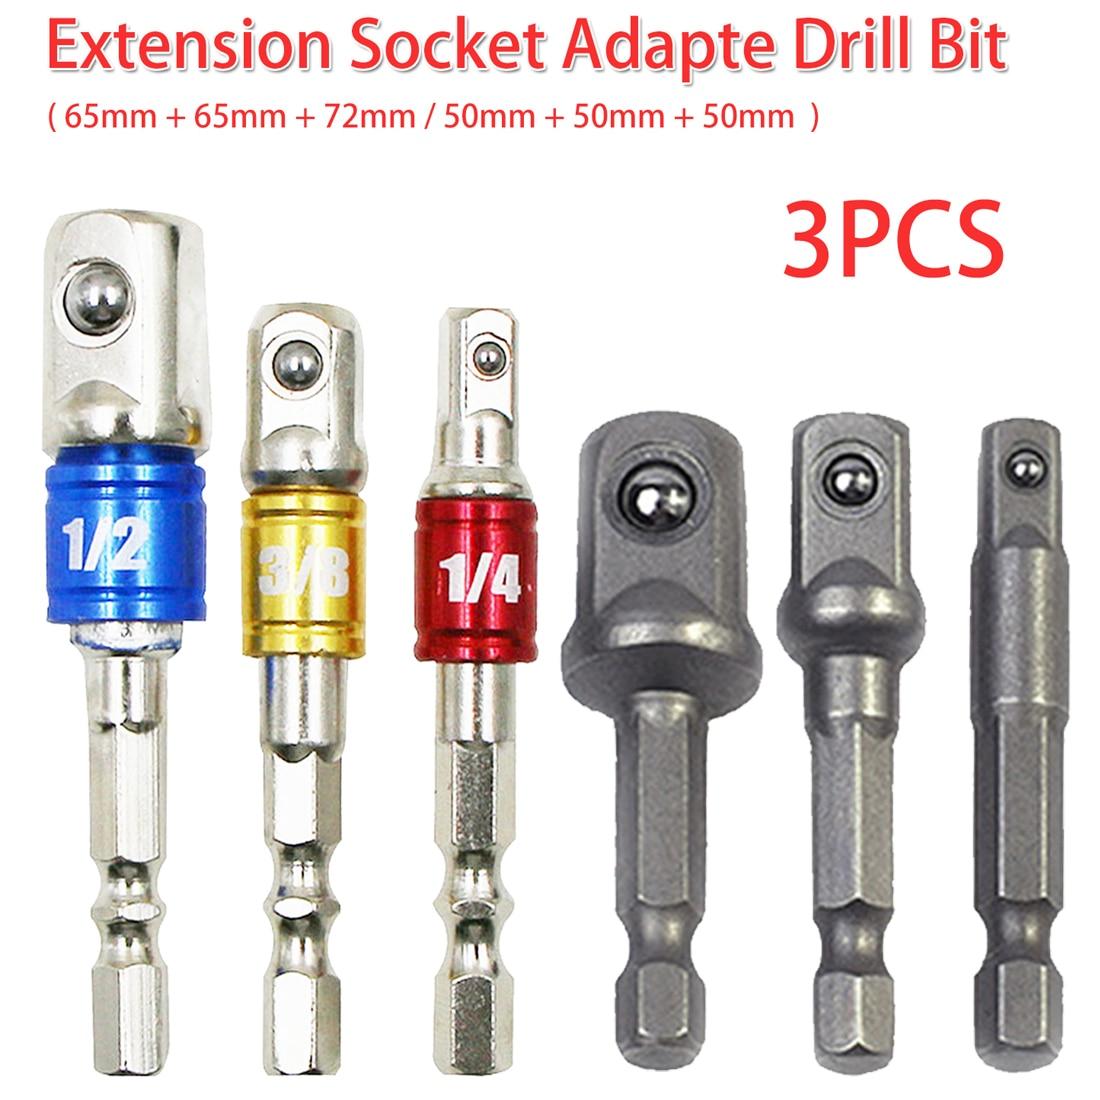 3pcs Socket Adapter Set 1/4 Hex Shank To 1/4